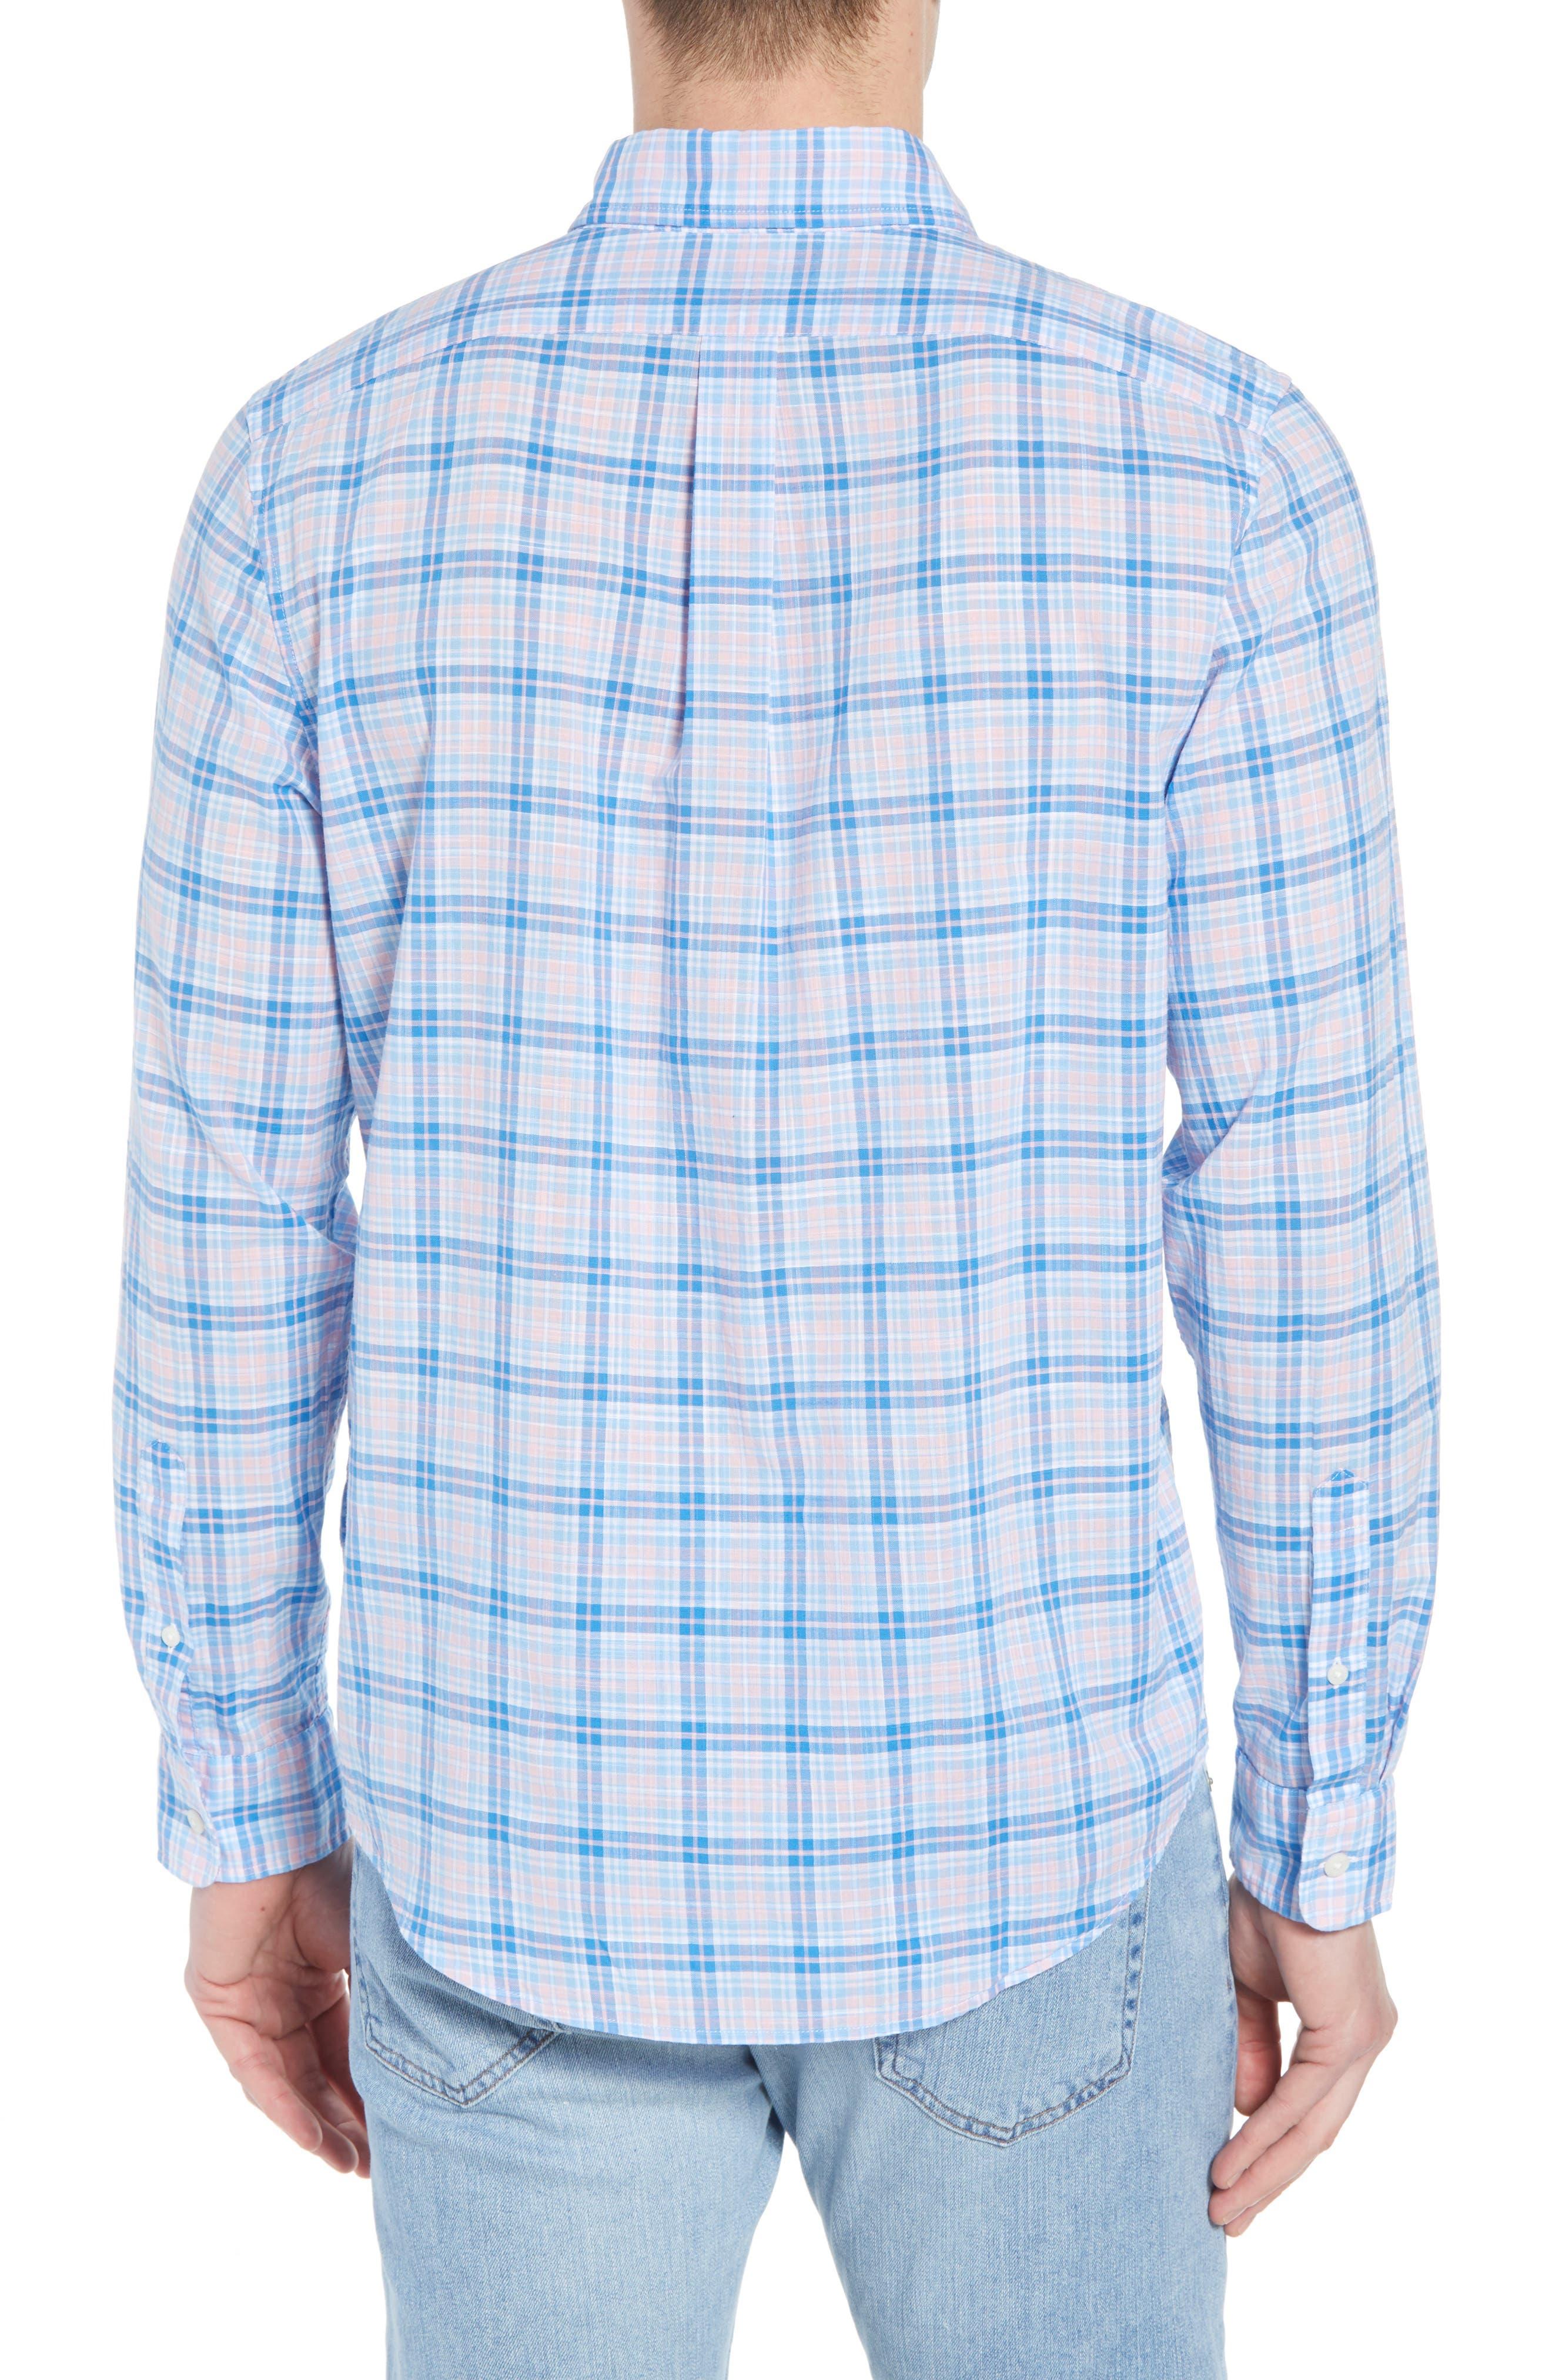 Stoney Hill Tucker Classic Fit Plaid Sport Shirt,                             Alternate thumbnail 3, color,                             Hibiscus